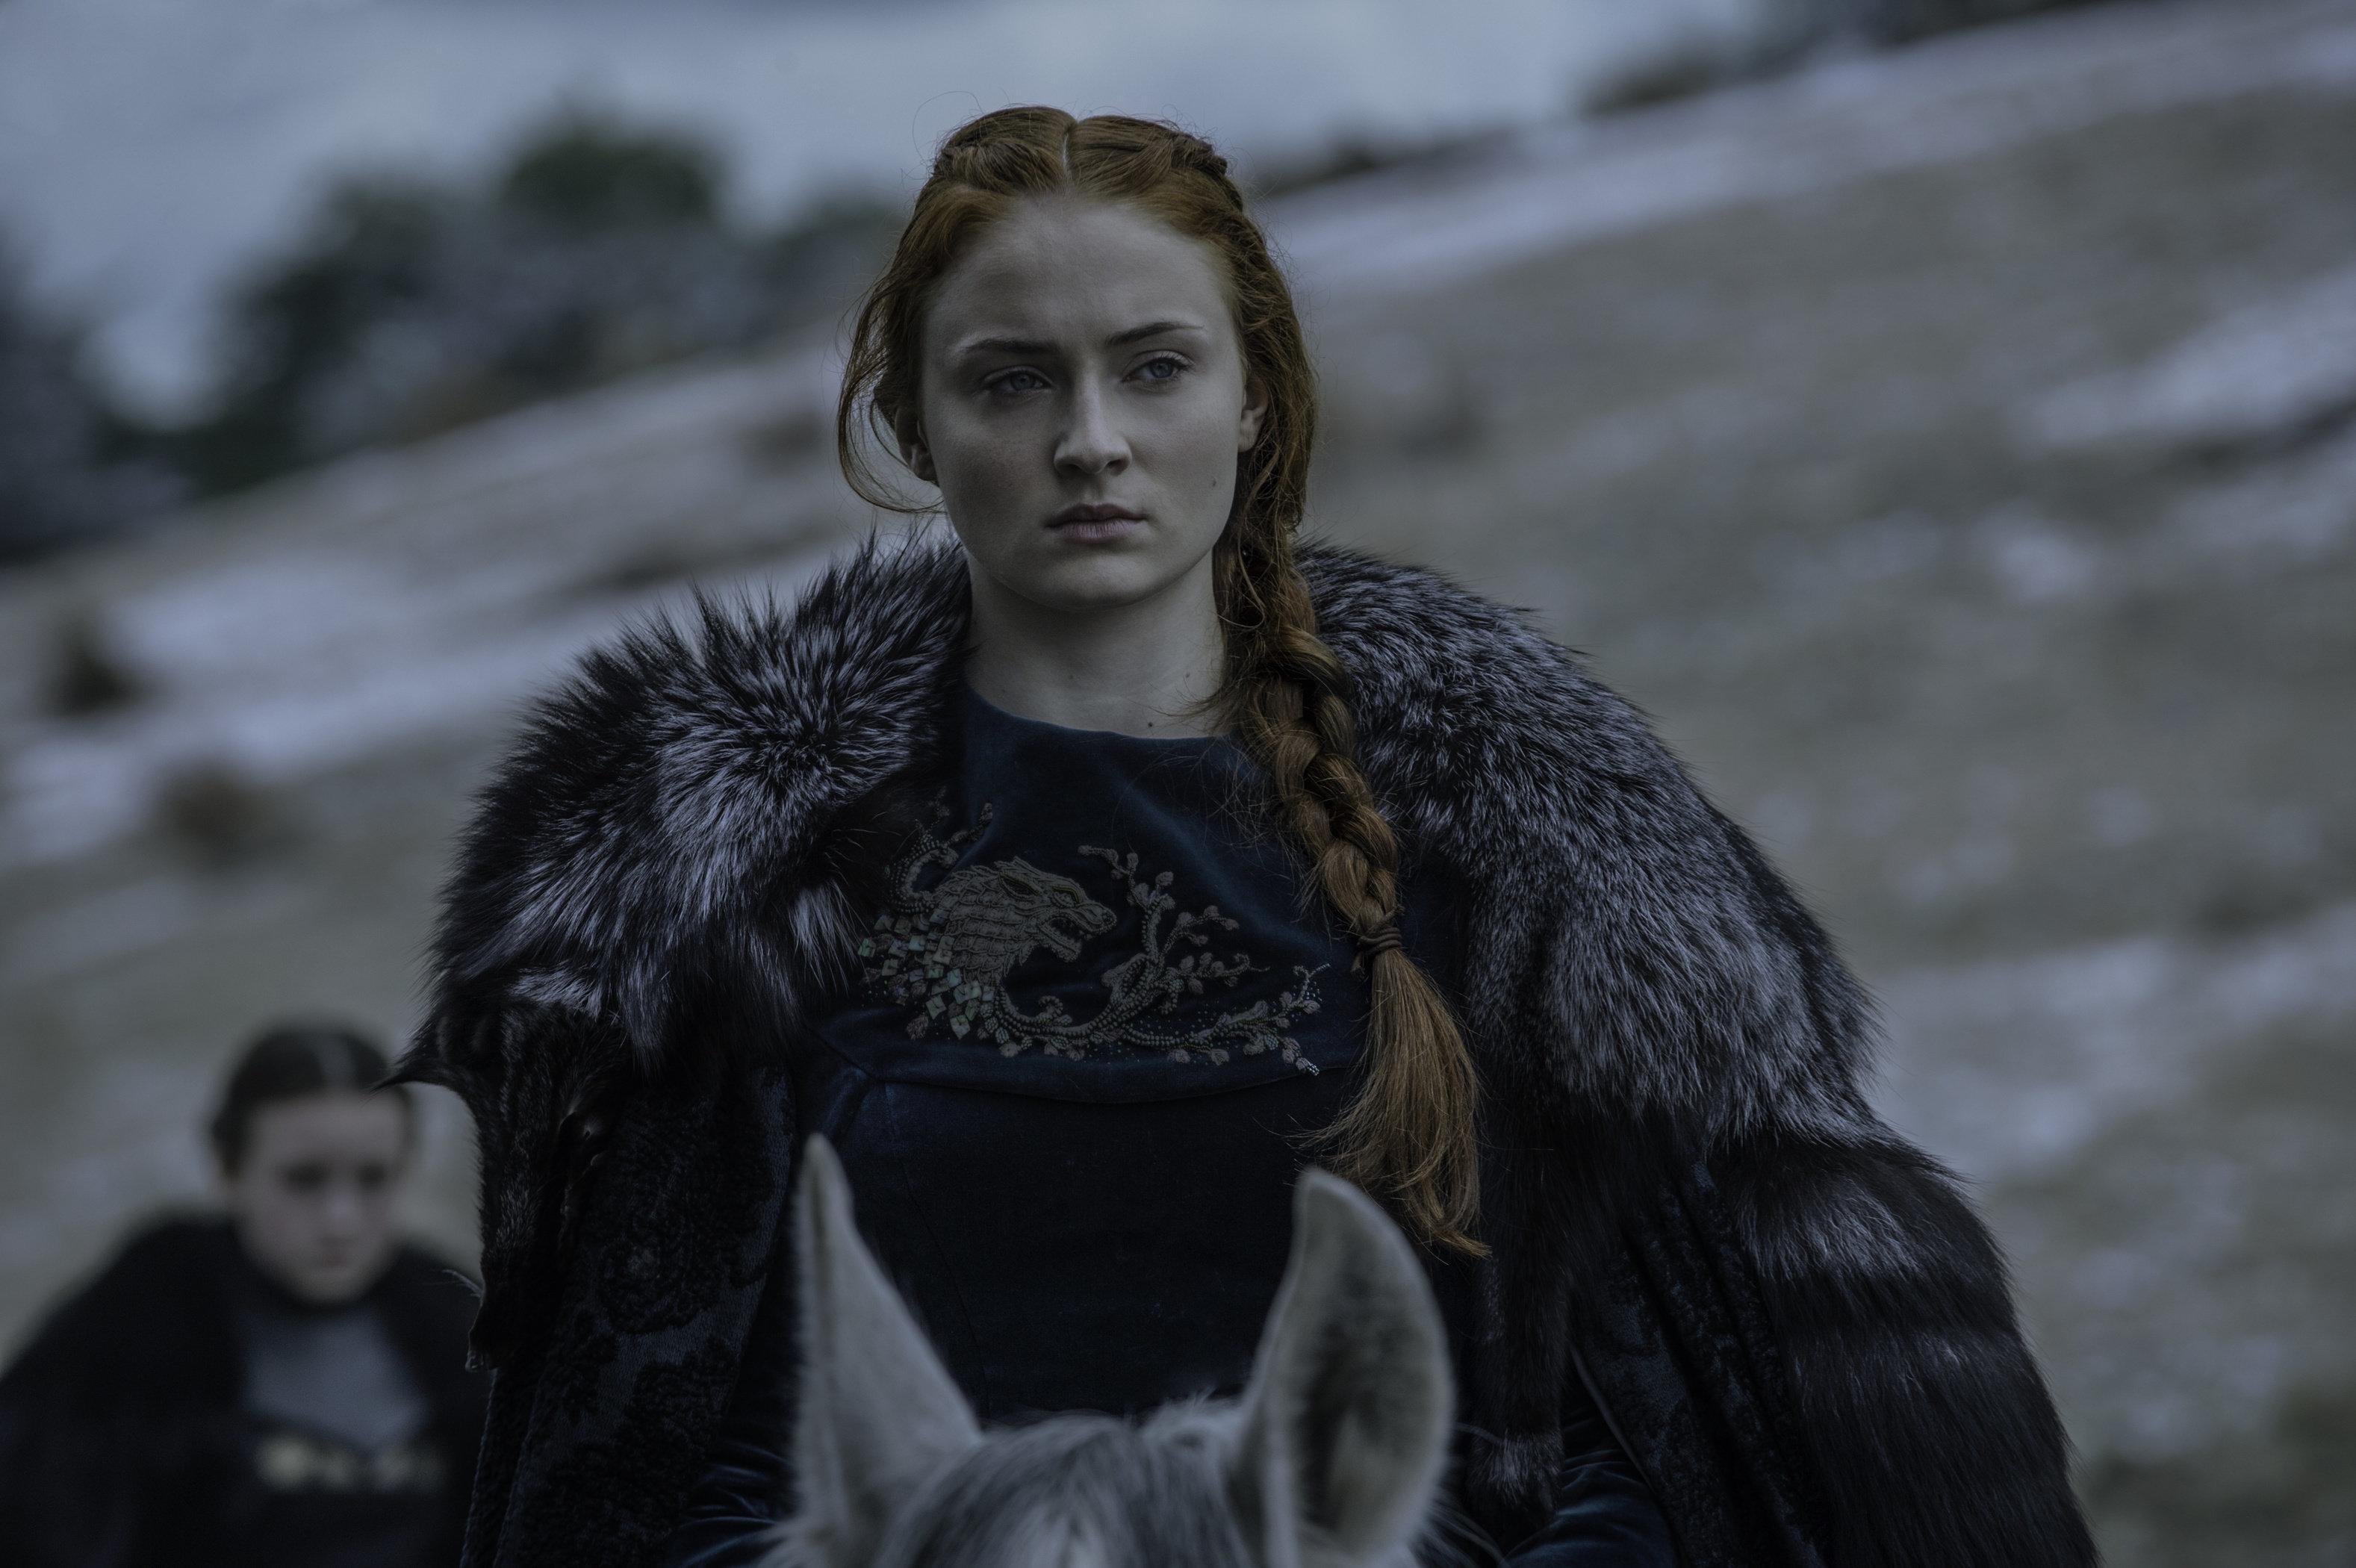 Sansa Stark is not here to